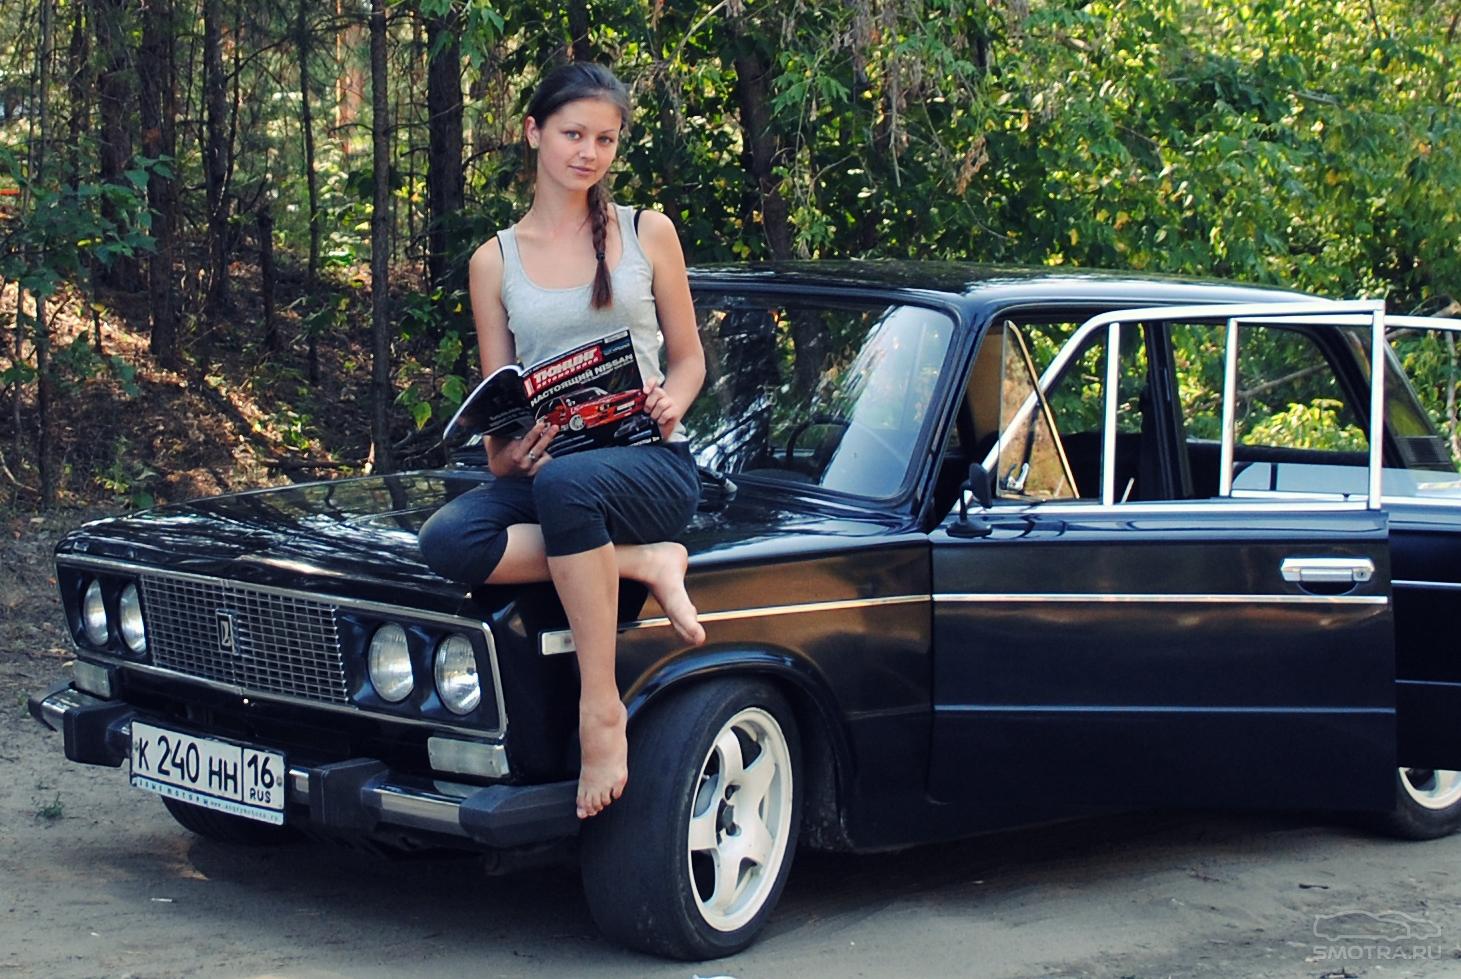 Фото голые девушки и ваз, Ваз и девушки ВКонтакте 5 фотография